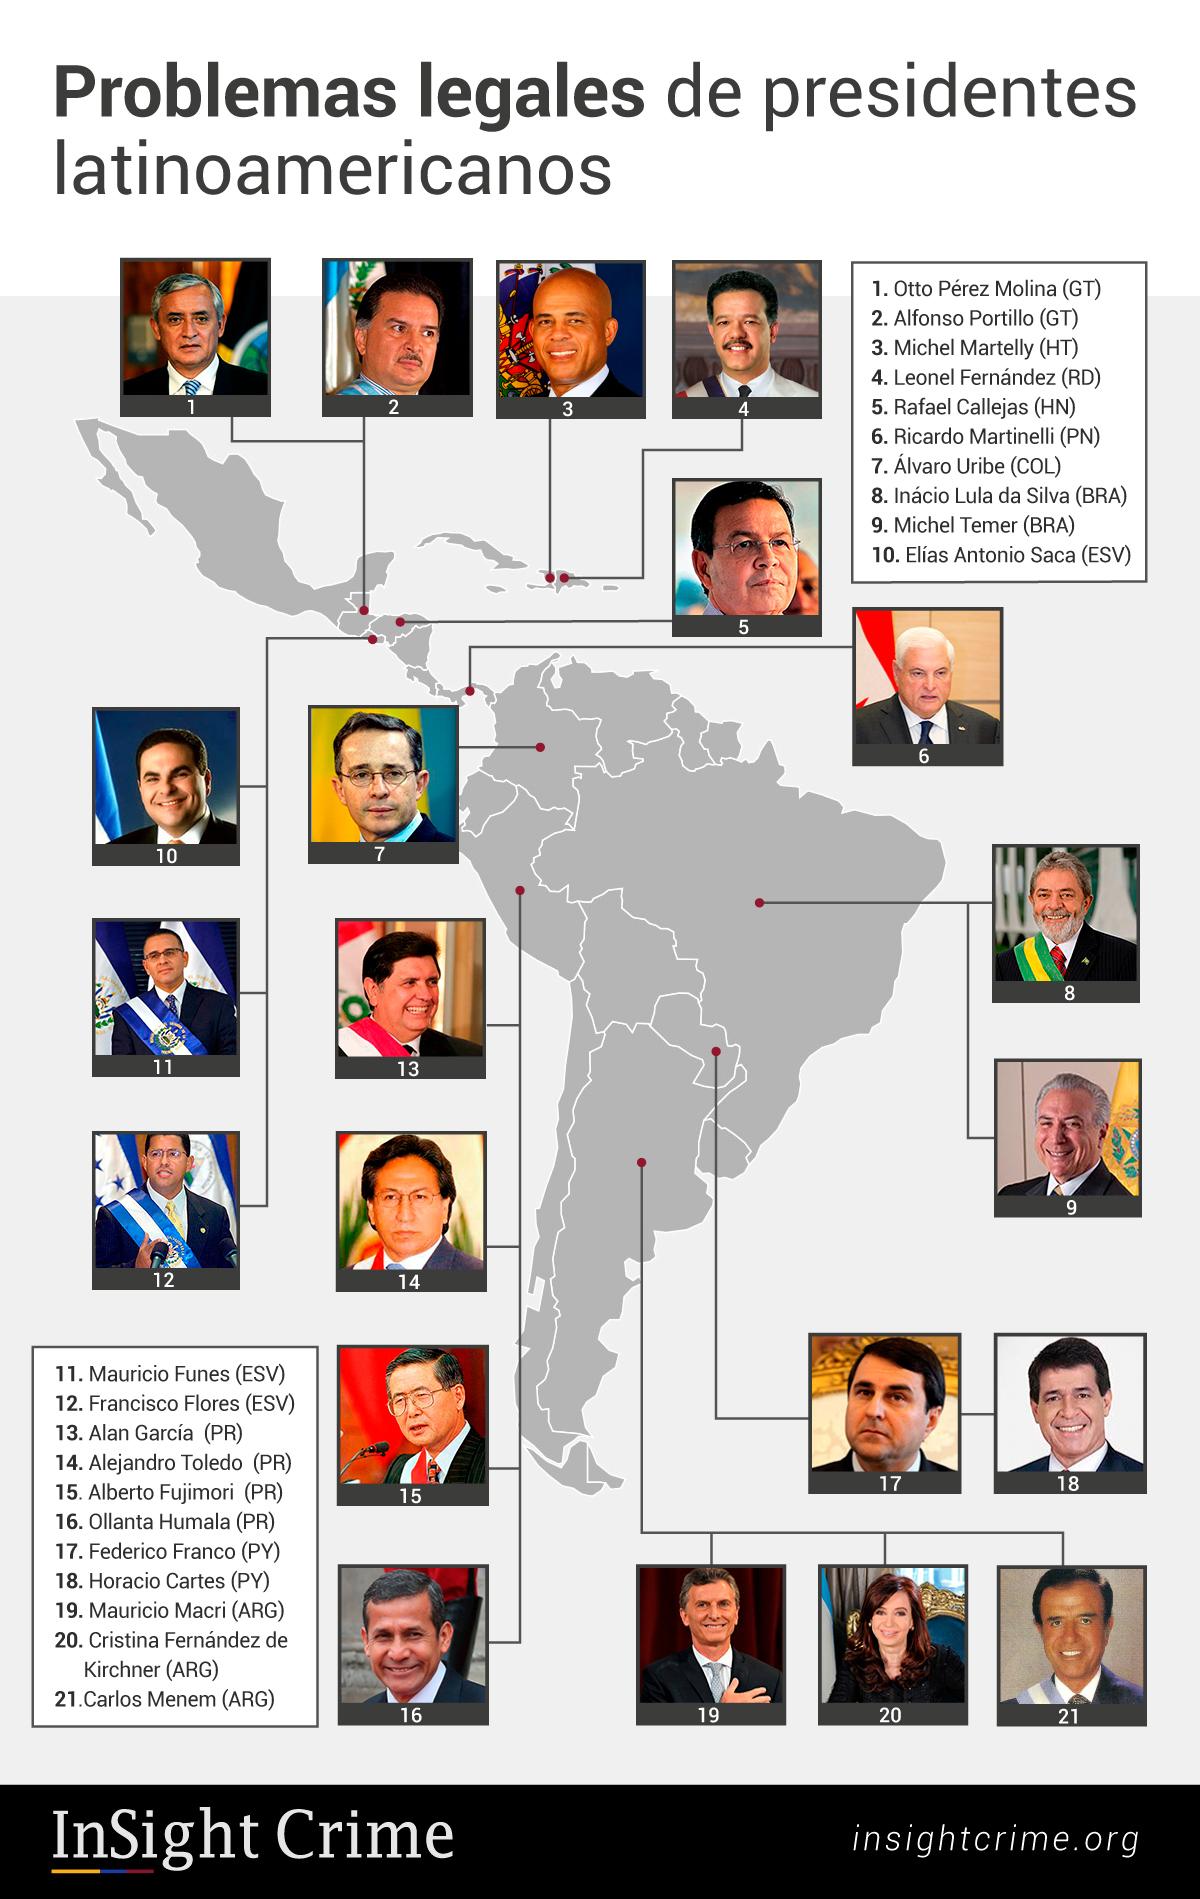 14 08 17 Problemas legales de presidentes latinoamericanos Insightcrime 1